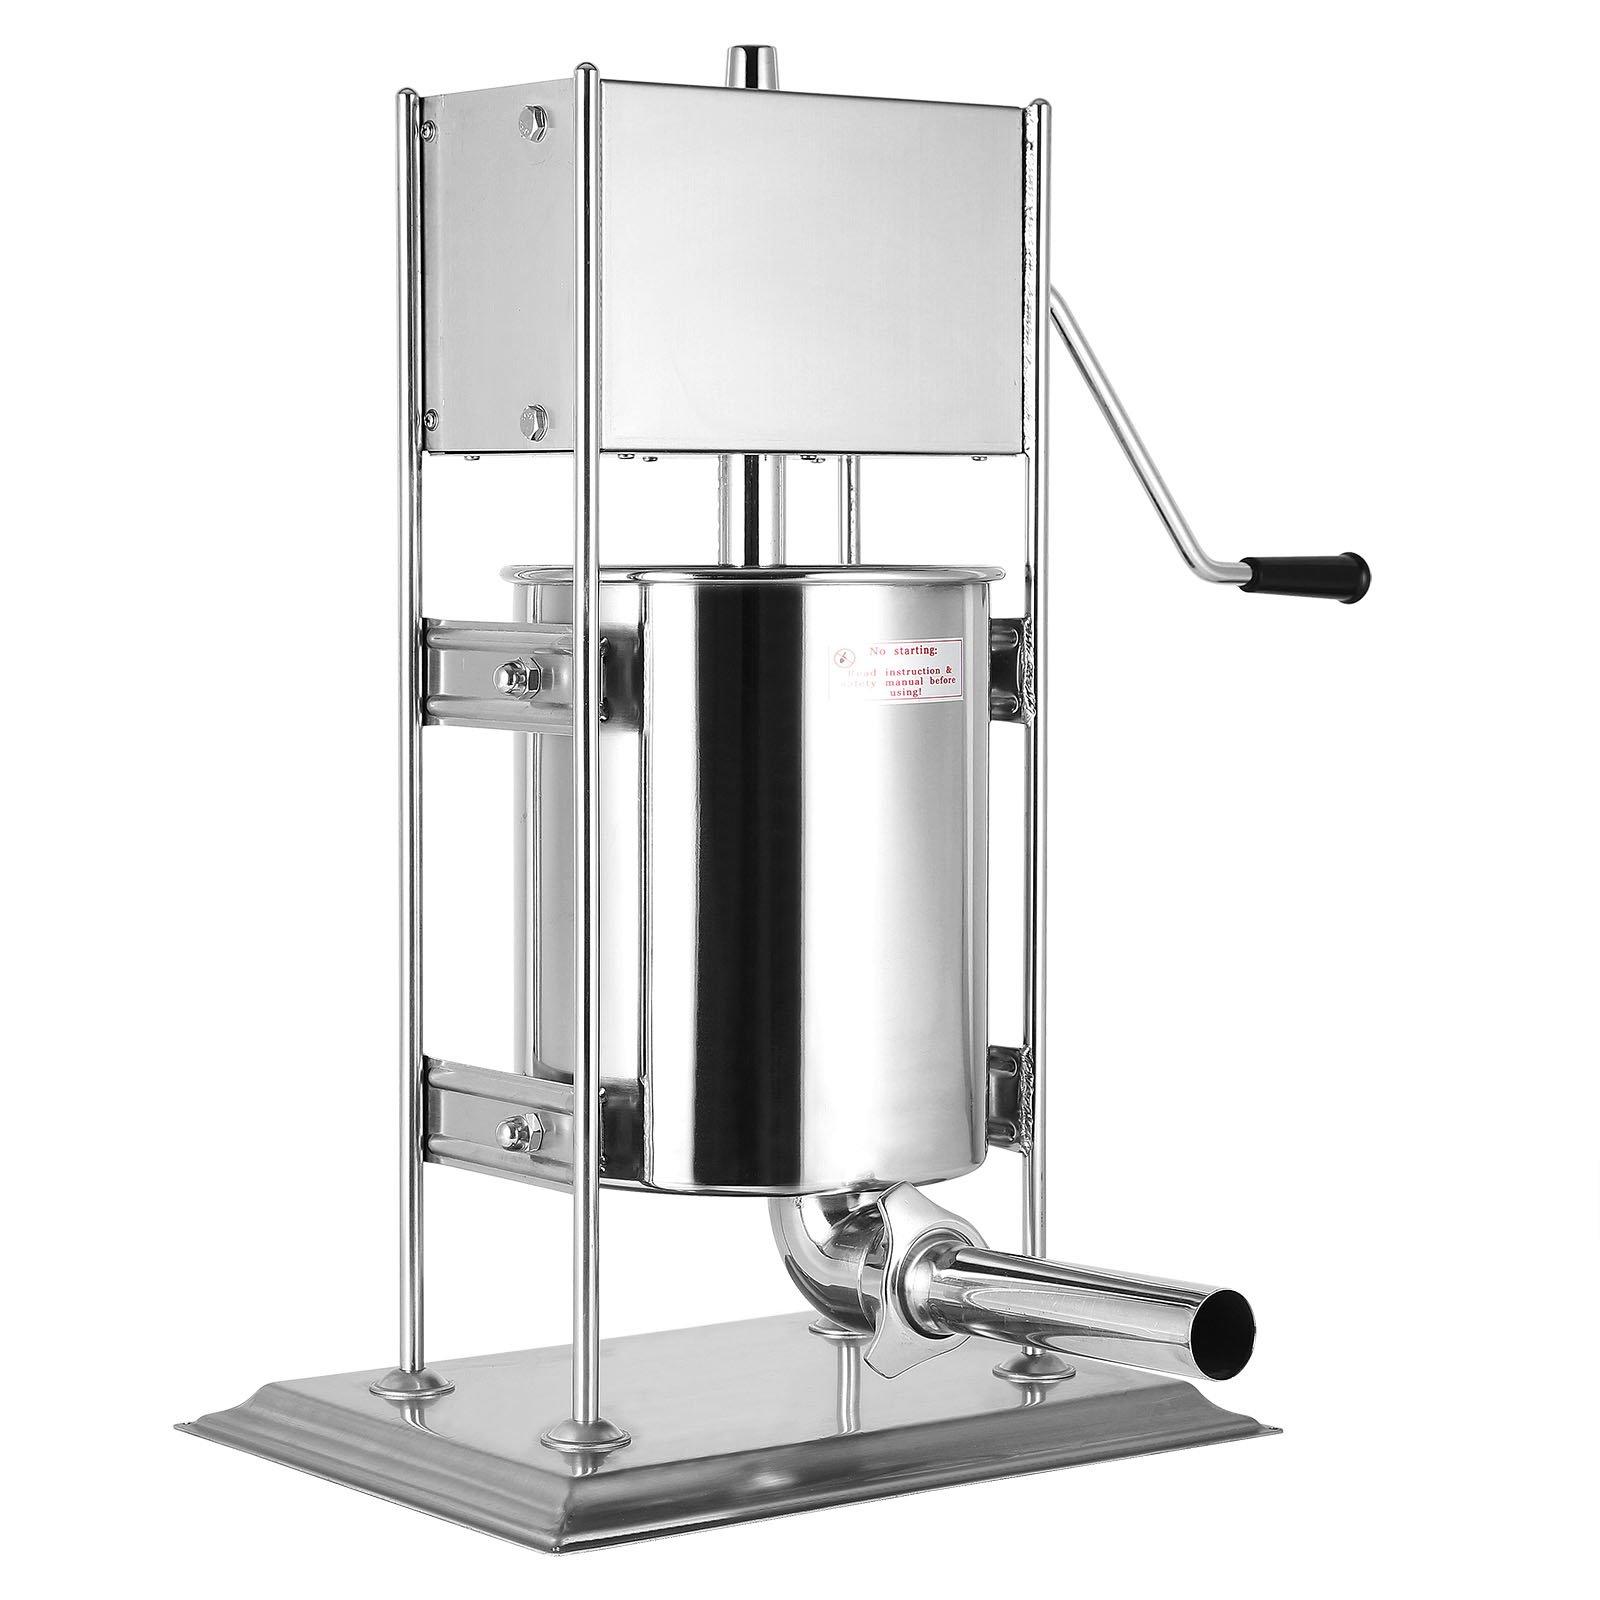 Ceny Sausage Filler Machine Stainless Steel Vertical Sausage MakerManual Commercial Grade Restaurant Meat Filler (10L/22LB)